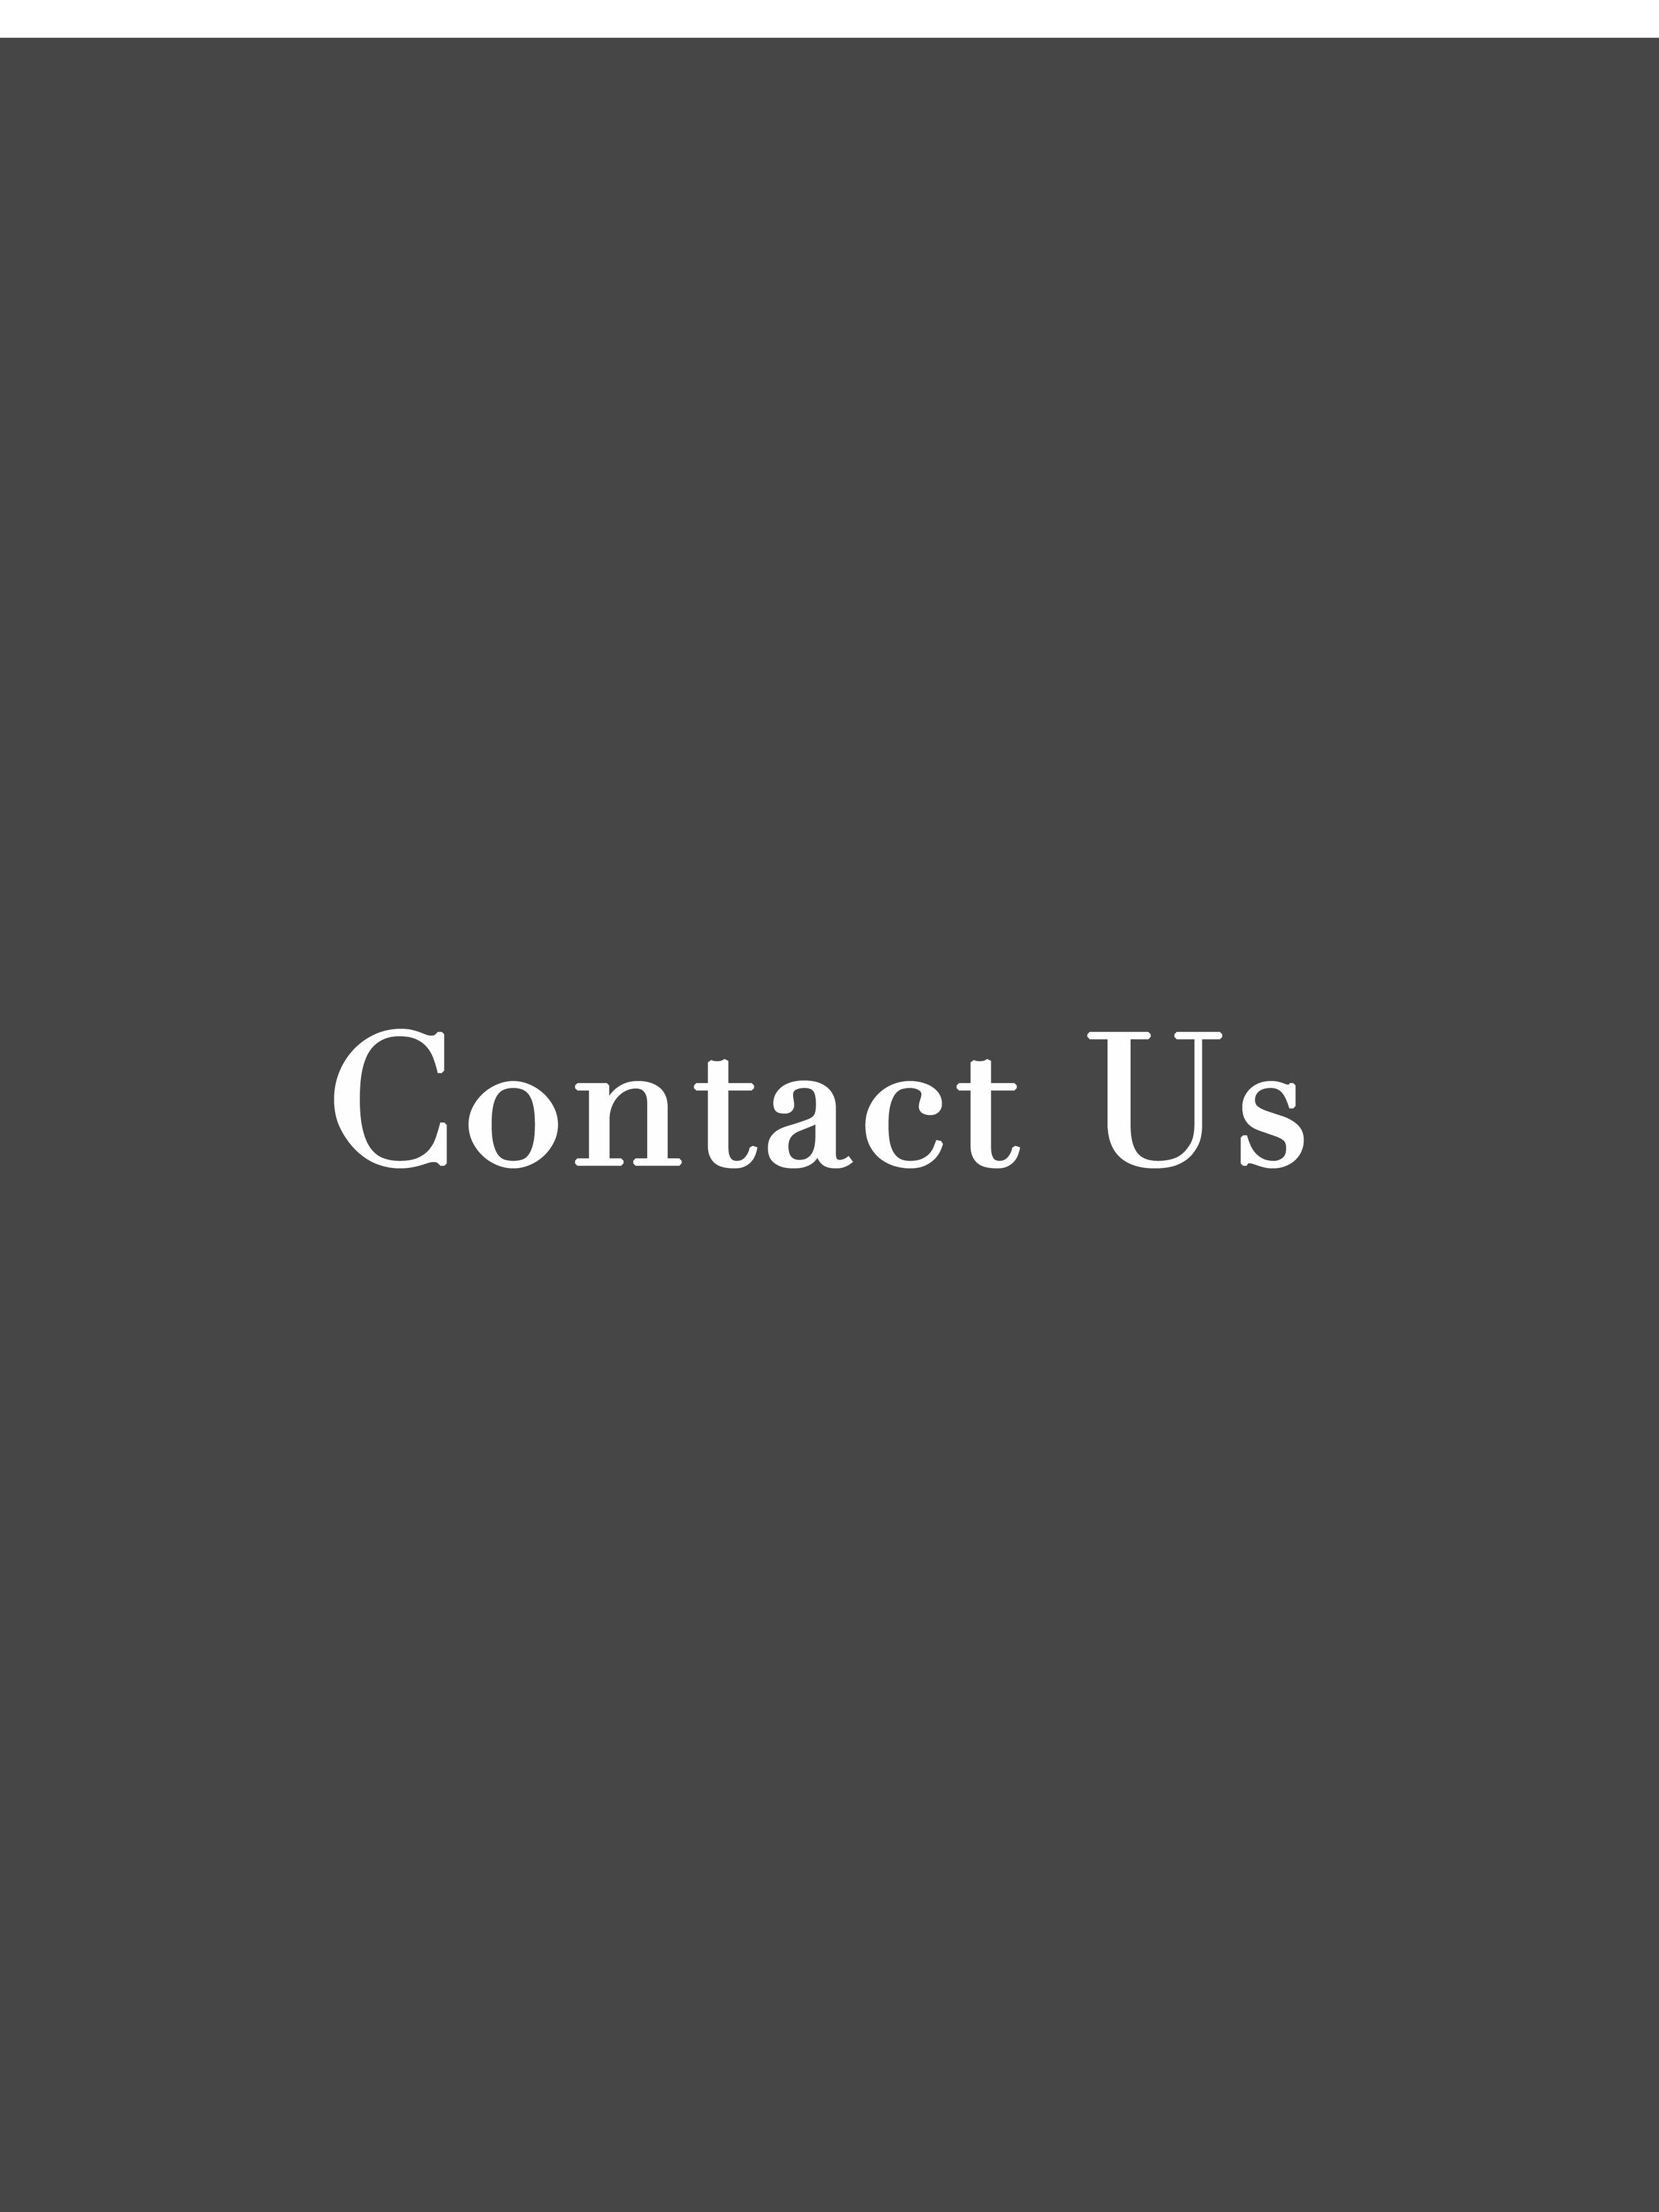 Contact Us_BG.jpg